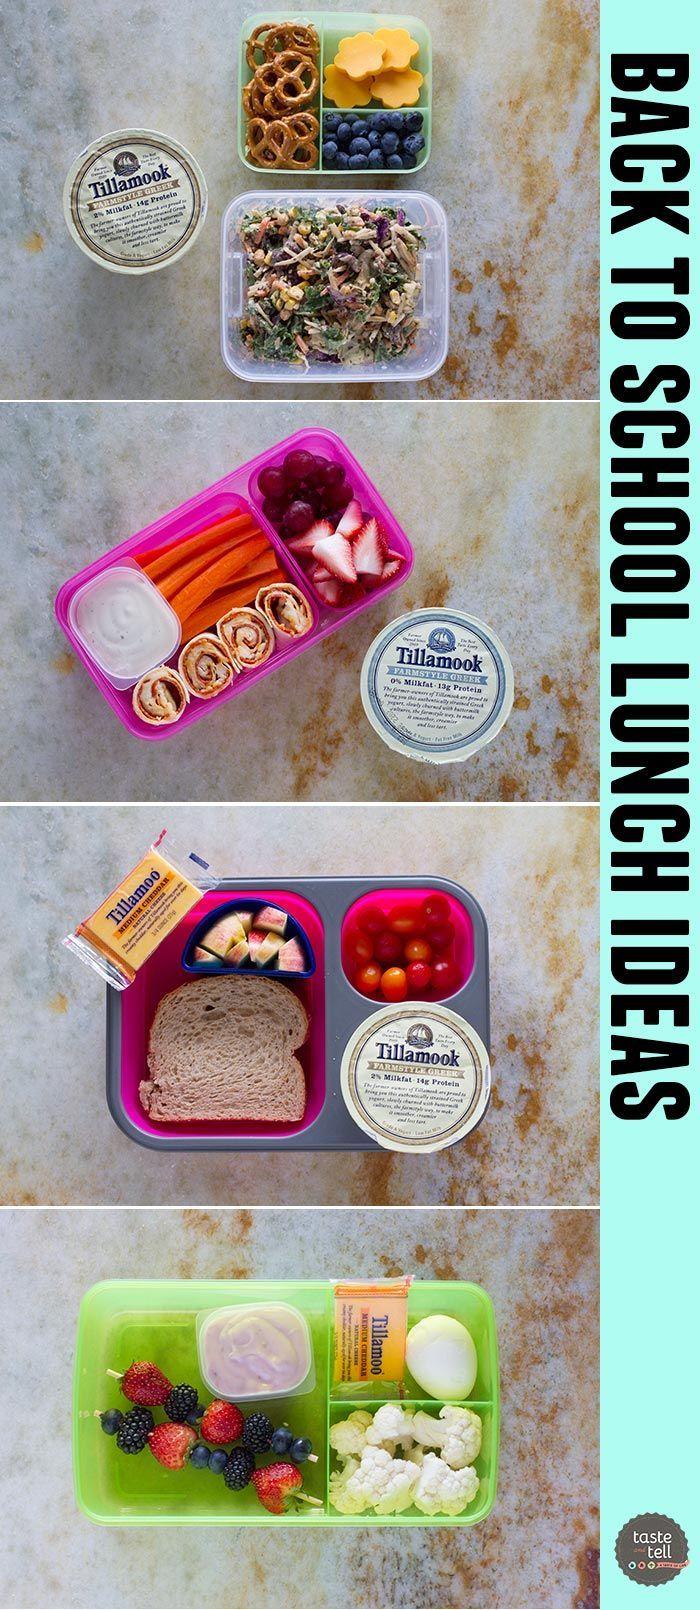 4 great school lunch ideas - great ways to de-junk the lunchbox!